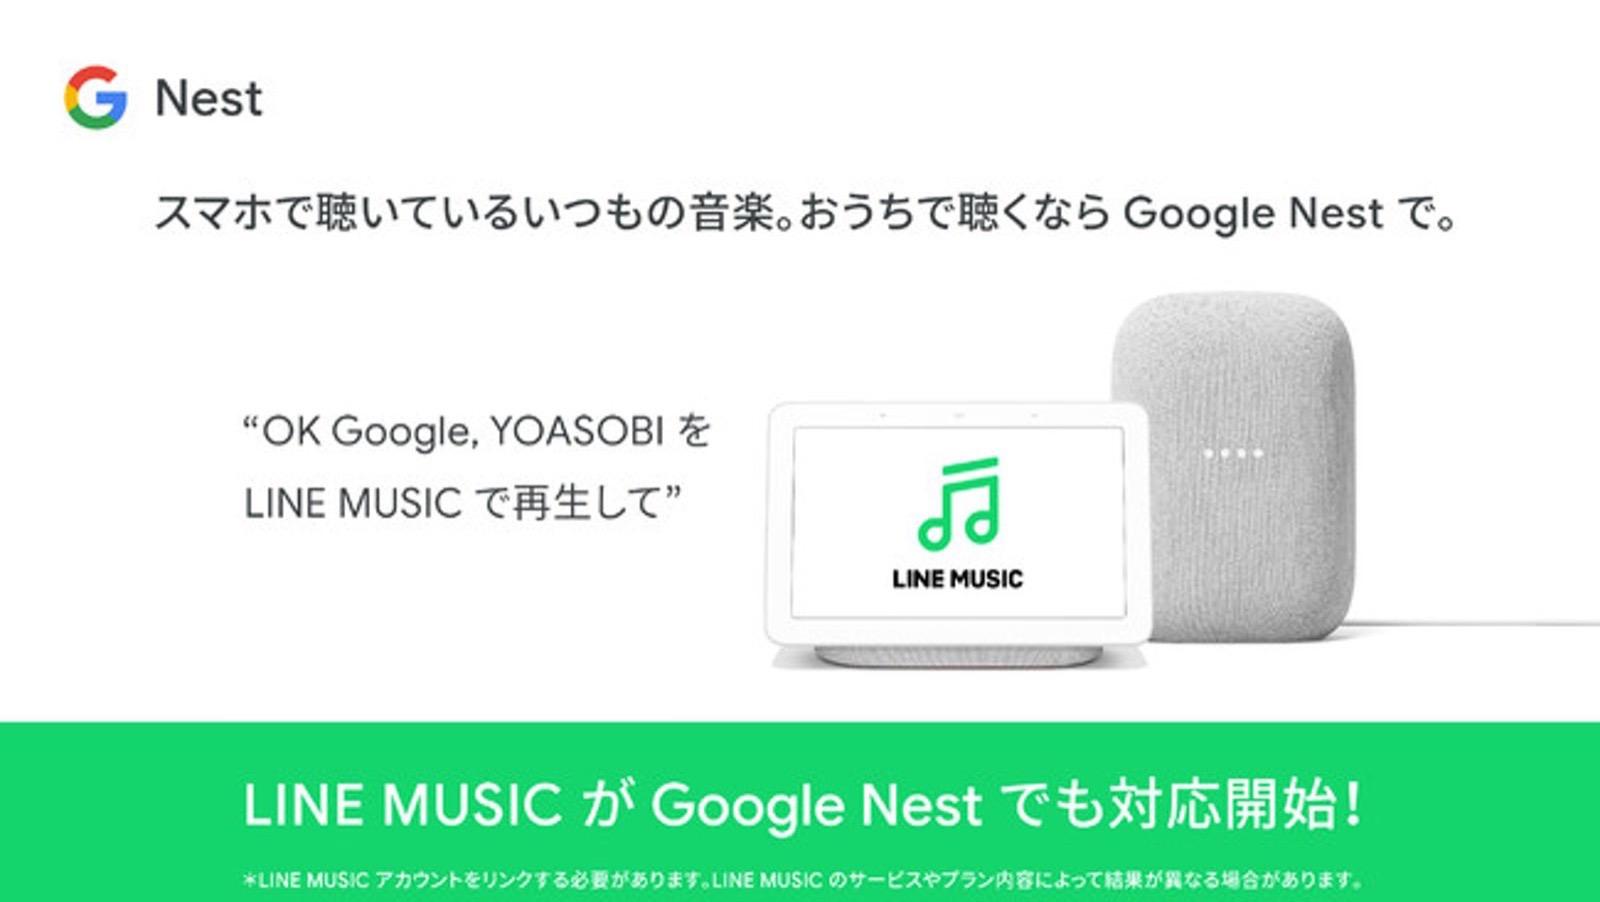 LINE MUSIC Google Nest Support